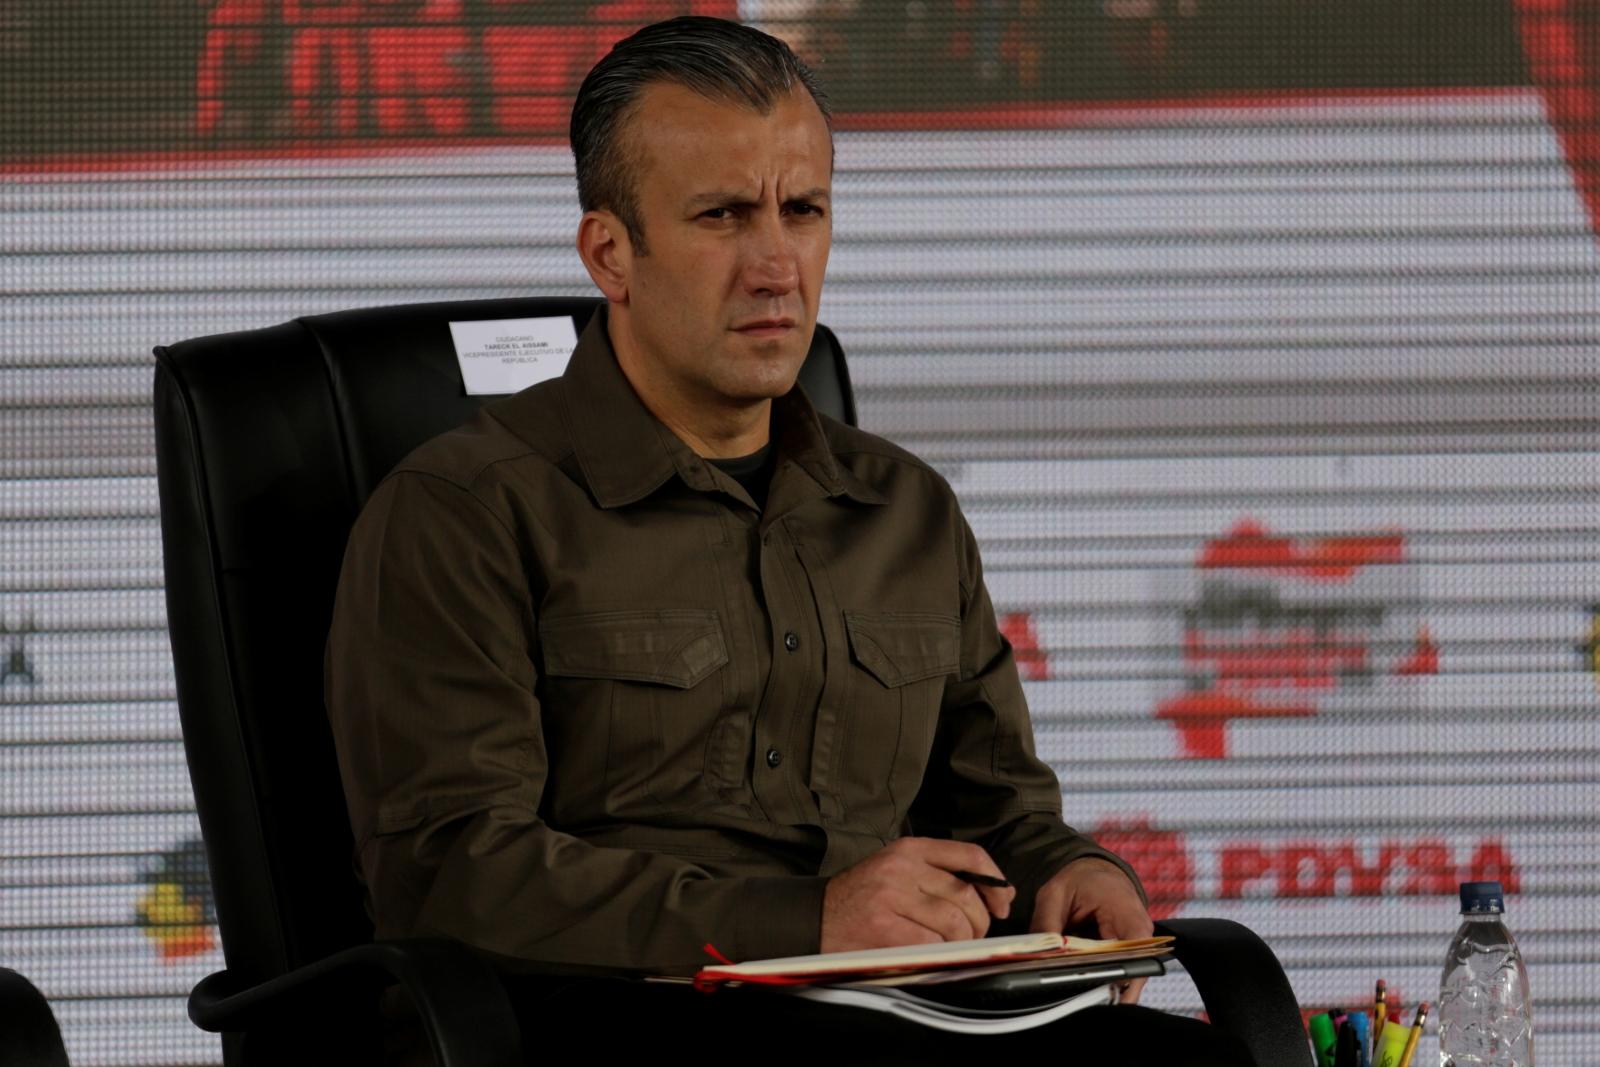 Venezuela's Vice President Tareck El Aissami